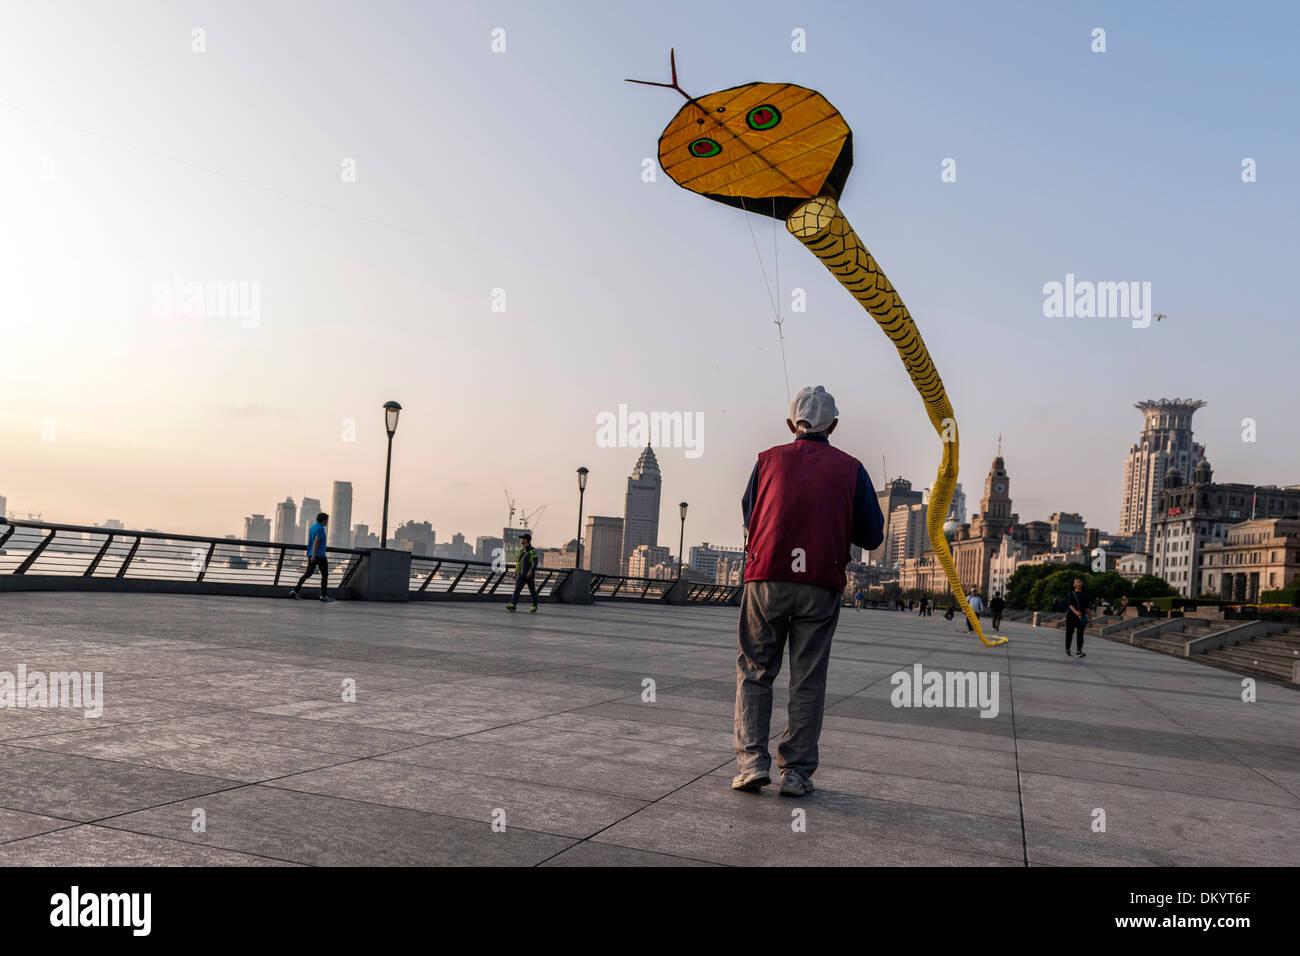 Kite flying at the Bund, waterfront, sunrise, Shanghai, China - Stock Image